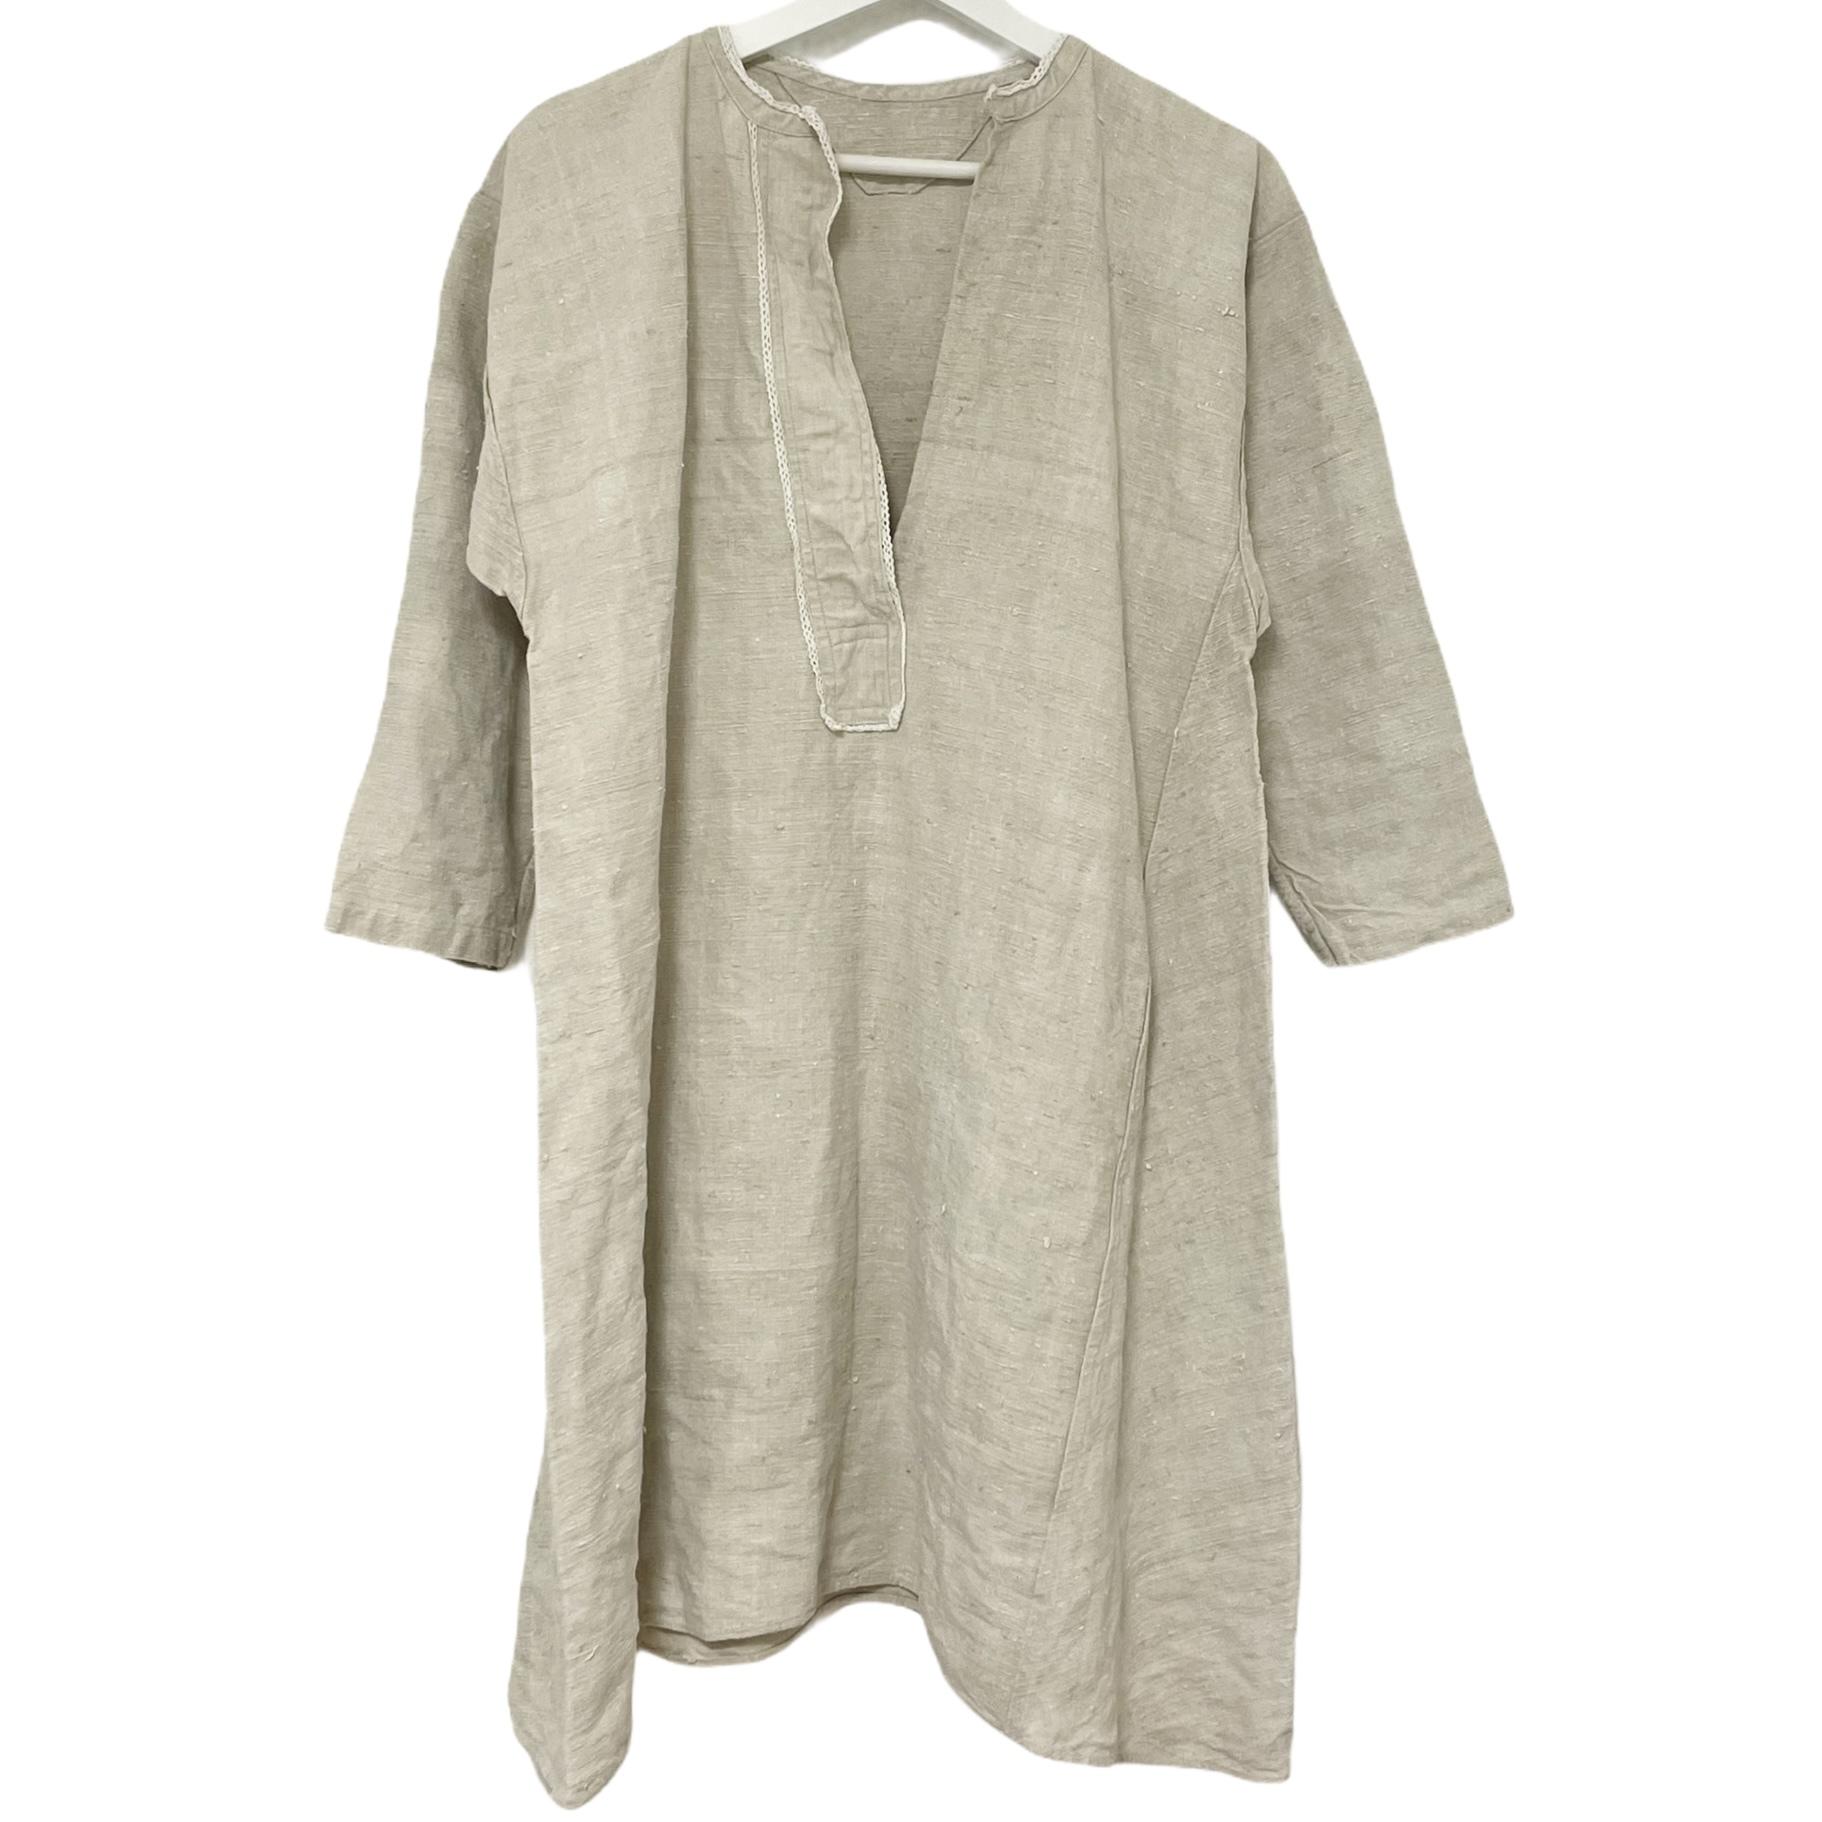 4 French Antique  Linen Shirt